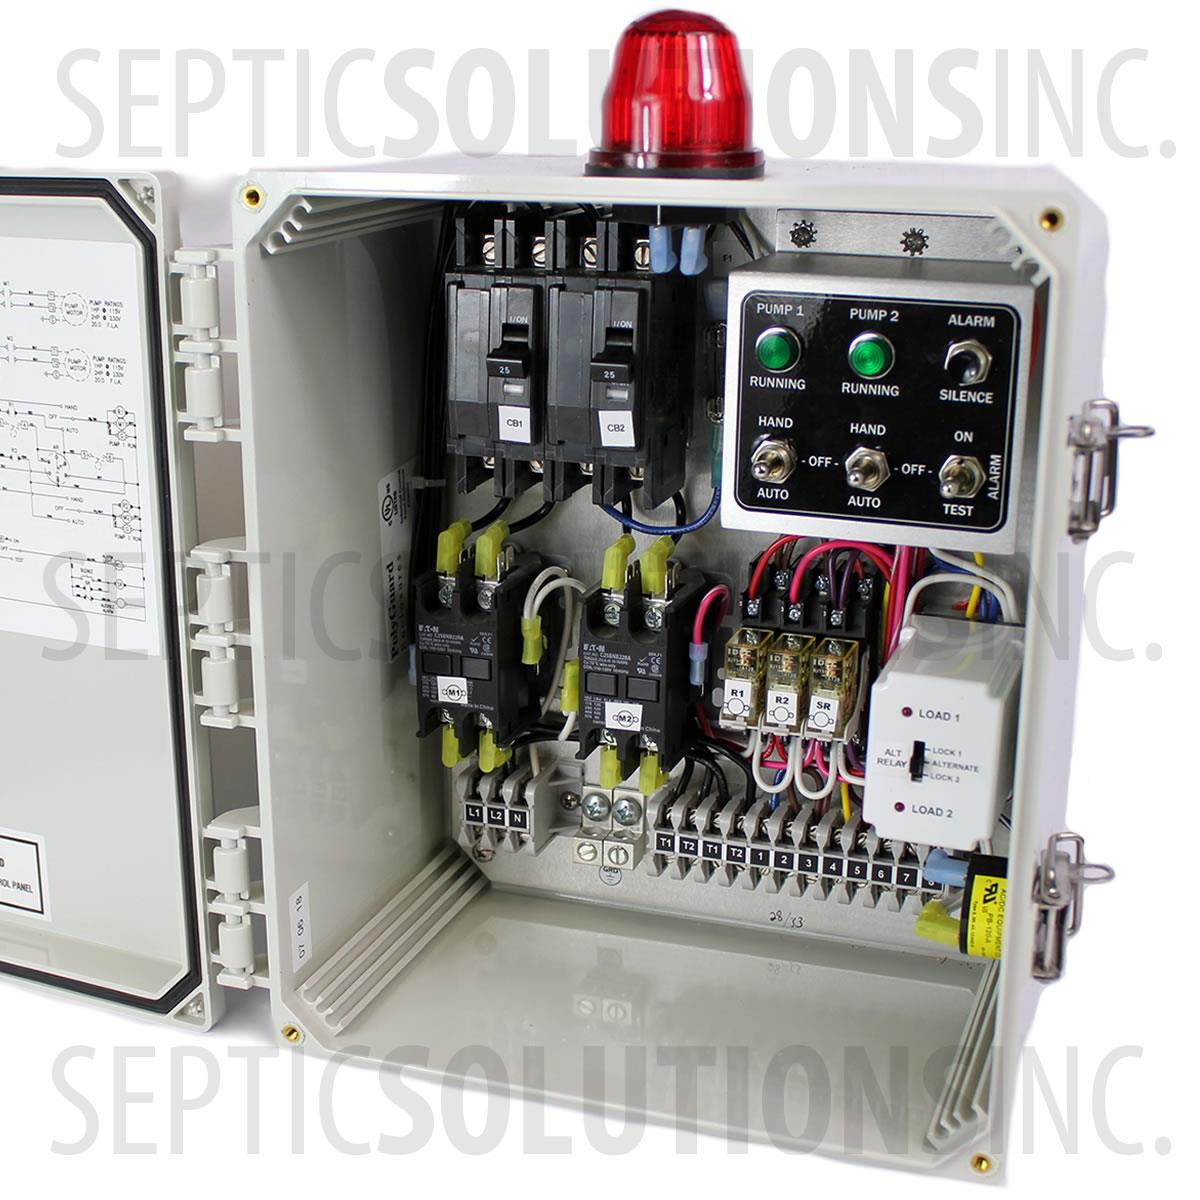 hight resolution of duplex pump control panel schematic low level switch motor sje rhombus wiring diagram panels sje control rhombus 1121w120h16b17c